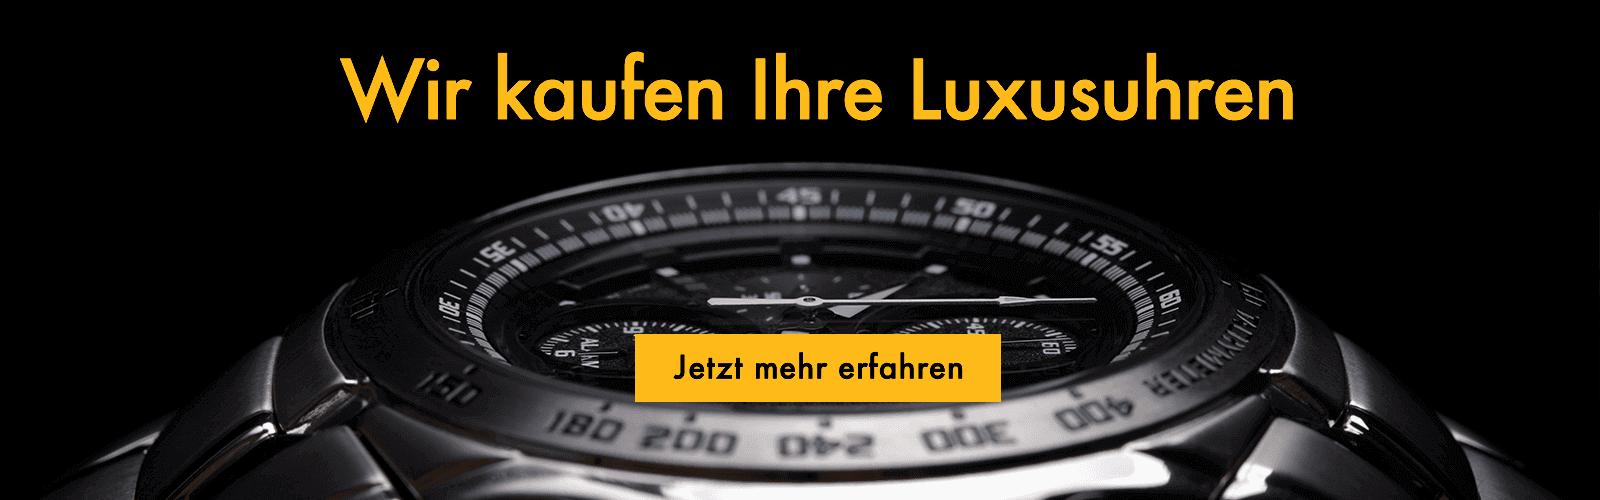 luxusuhren